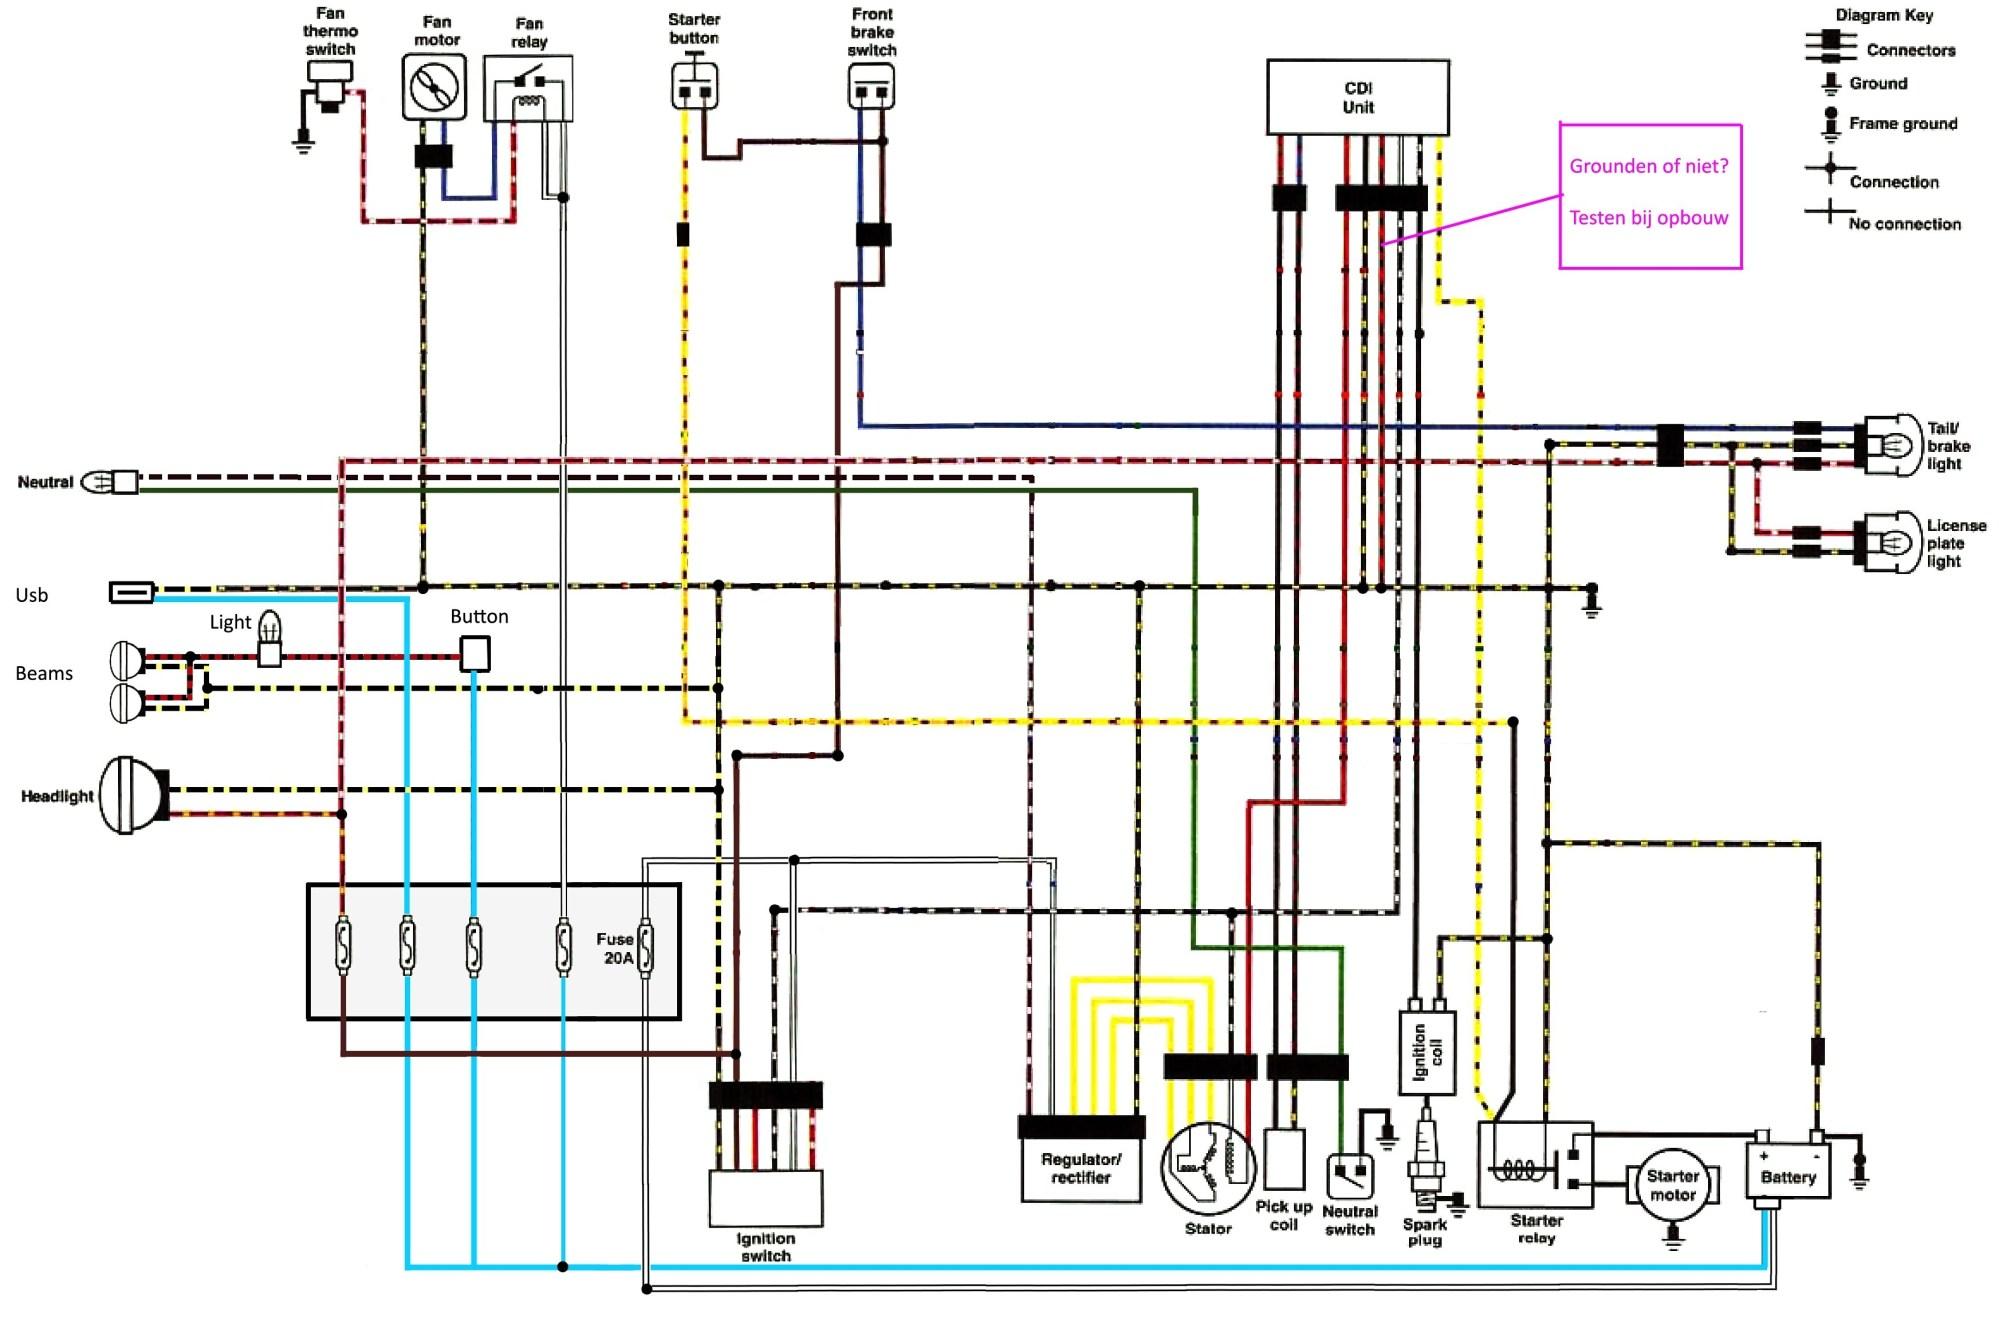 hight resolution of john deere lt155 wiring diagram manual e books john deere lt155 wiring diagram